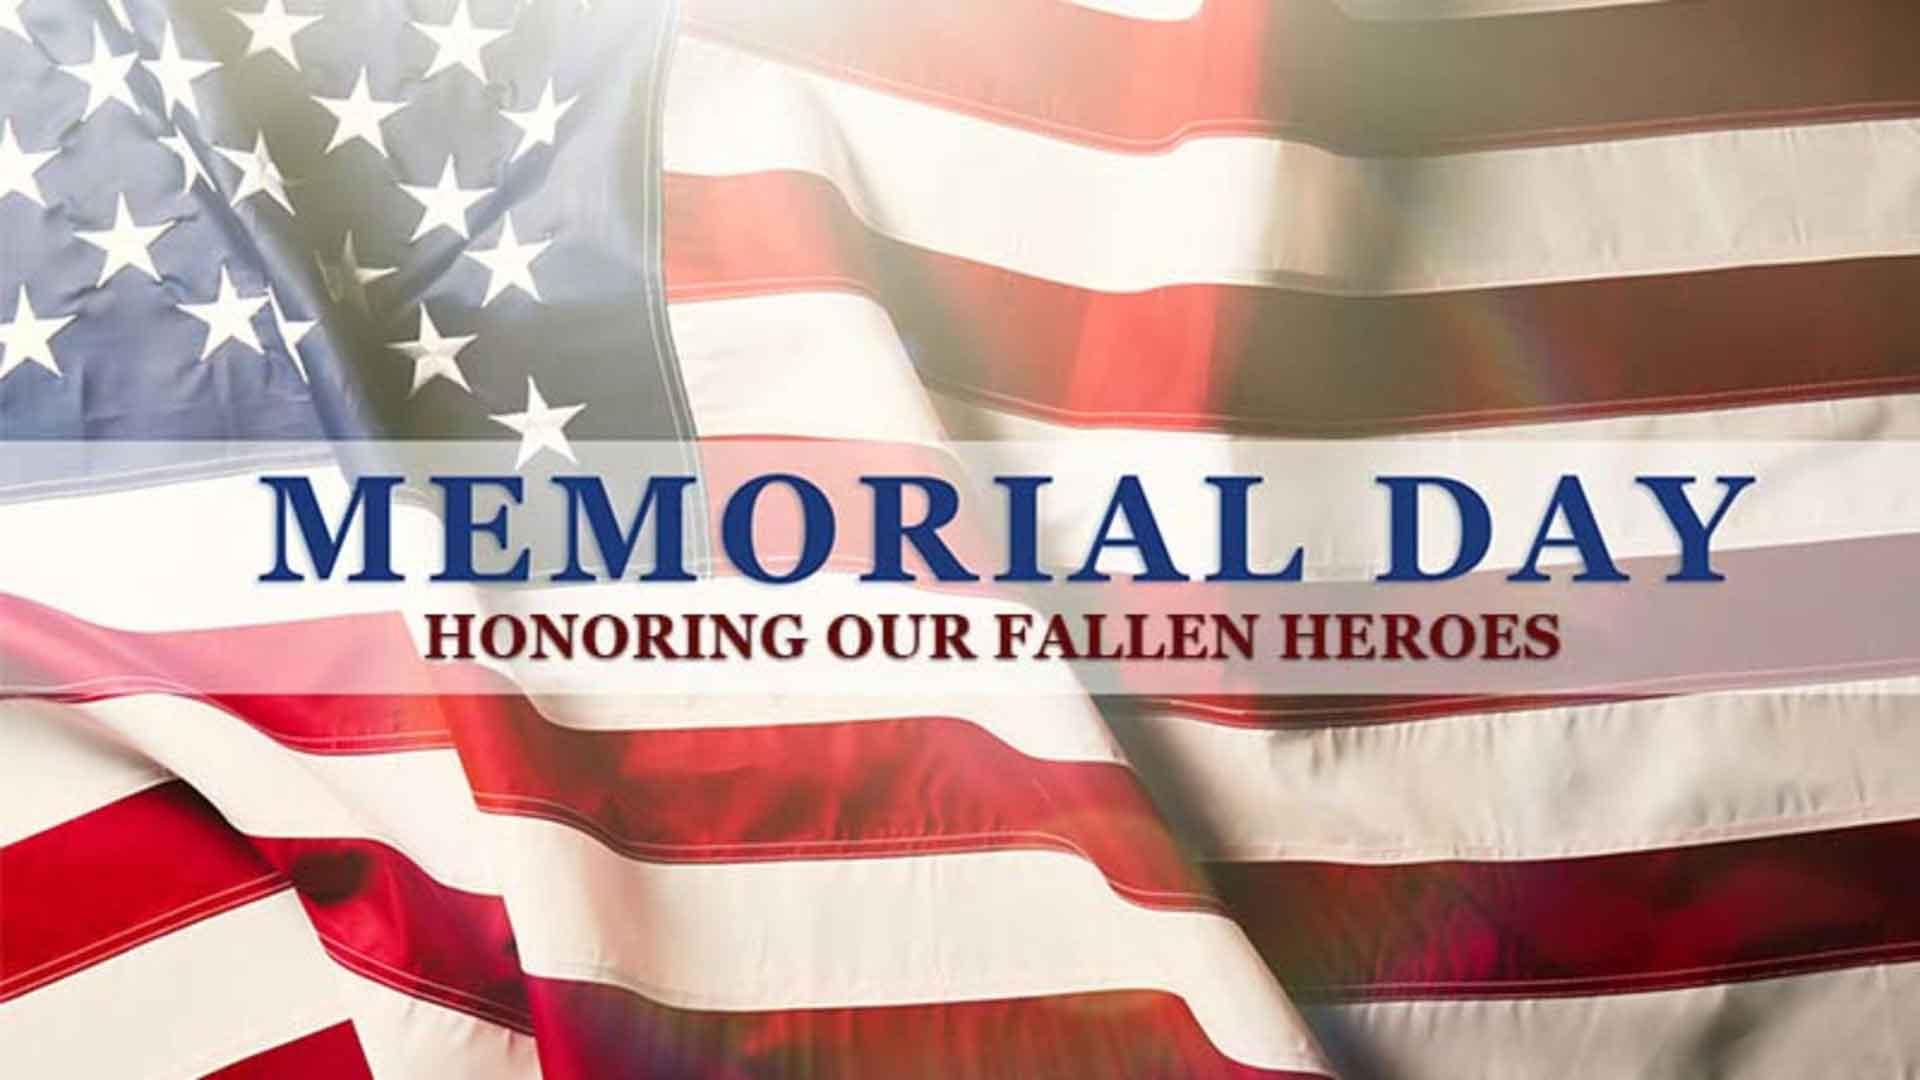 Memorial Day Service at Shady Shores